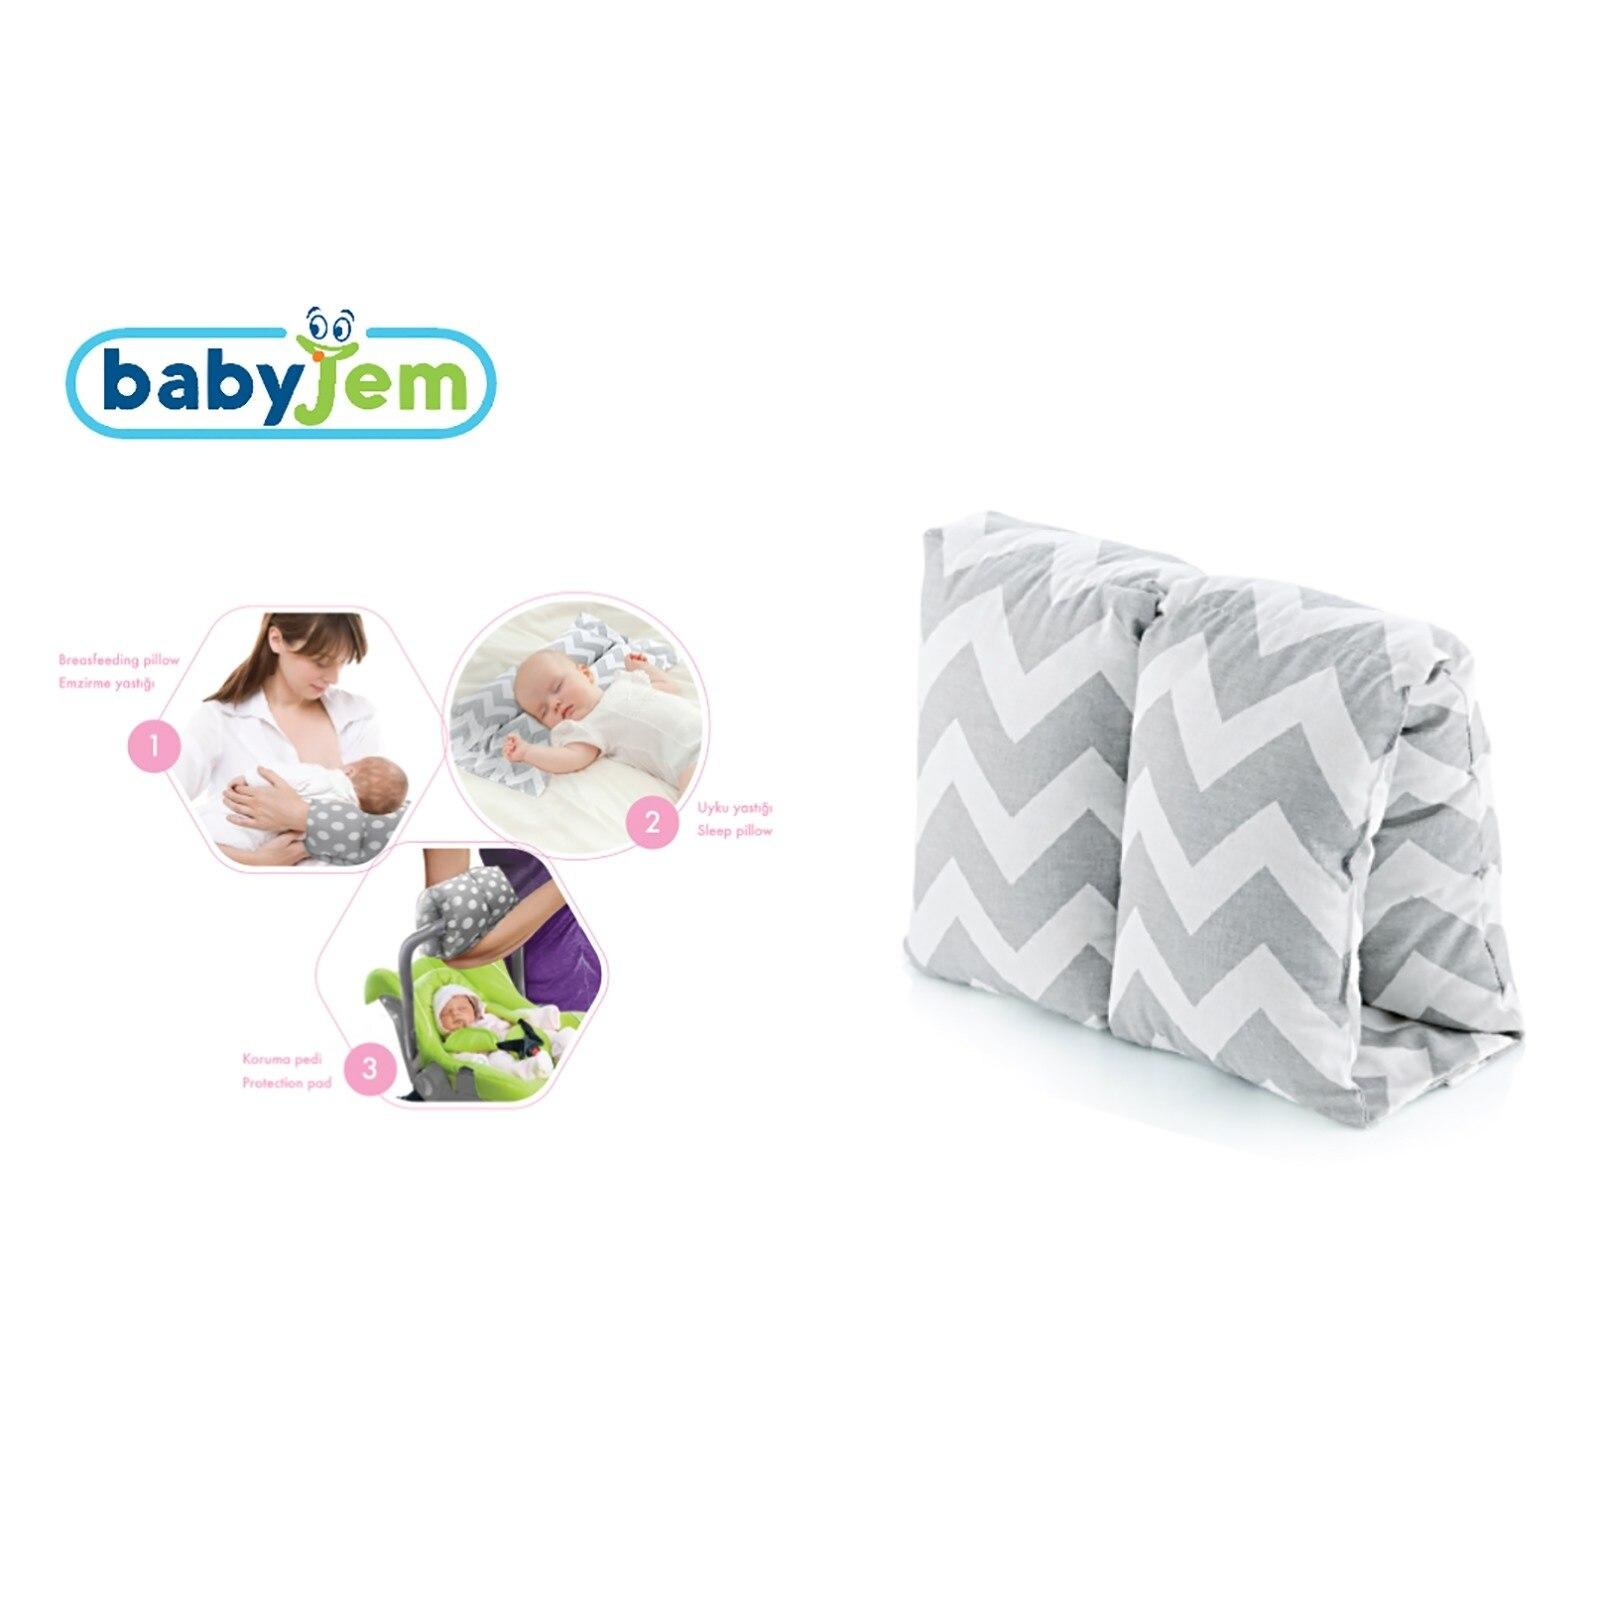 Ebebek Babyjem Multi-Purpose Nursing Breastfeeding Pillow